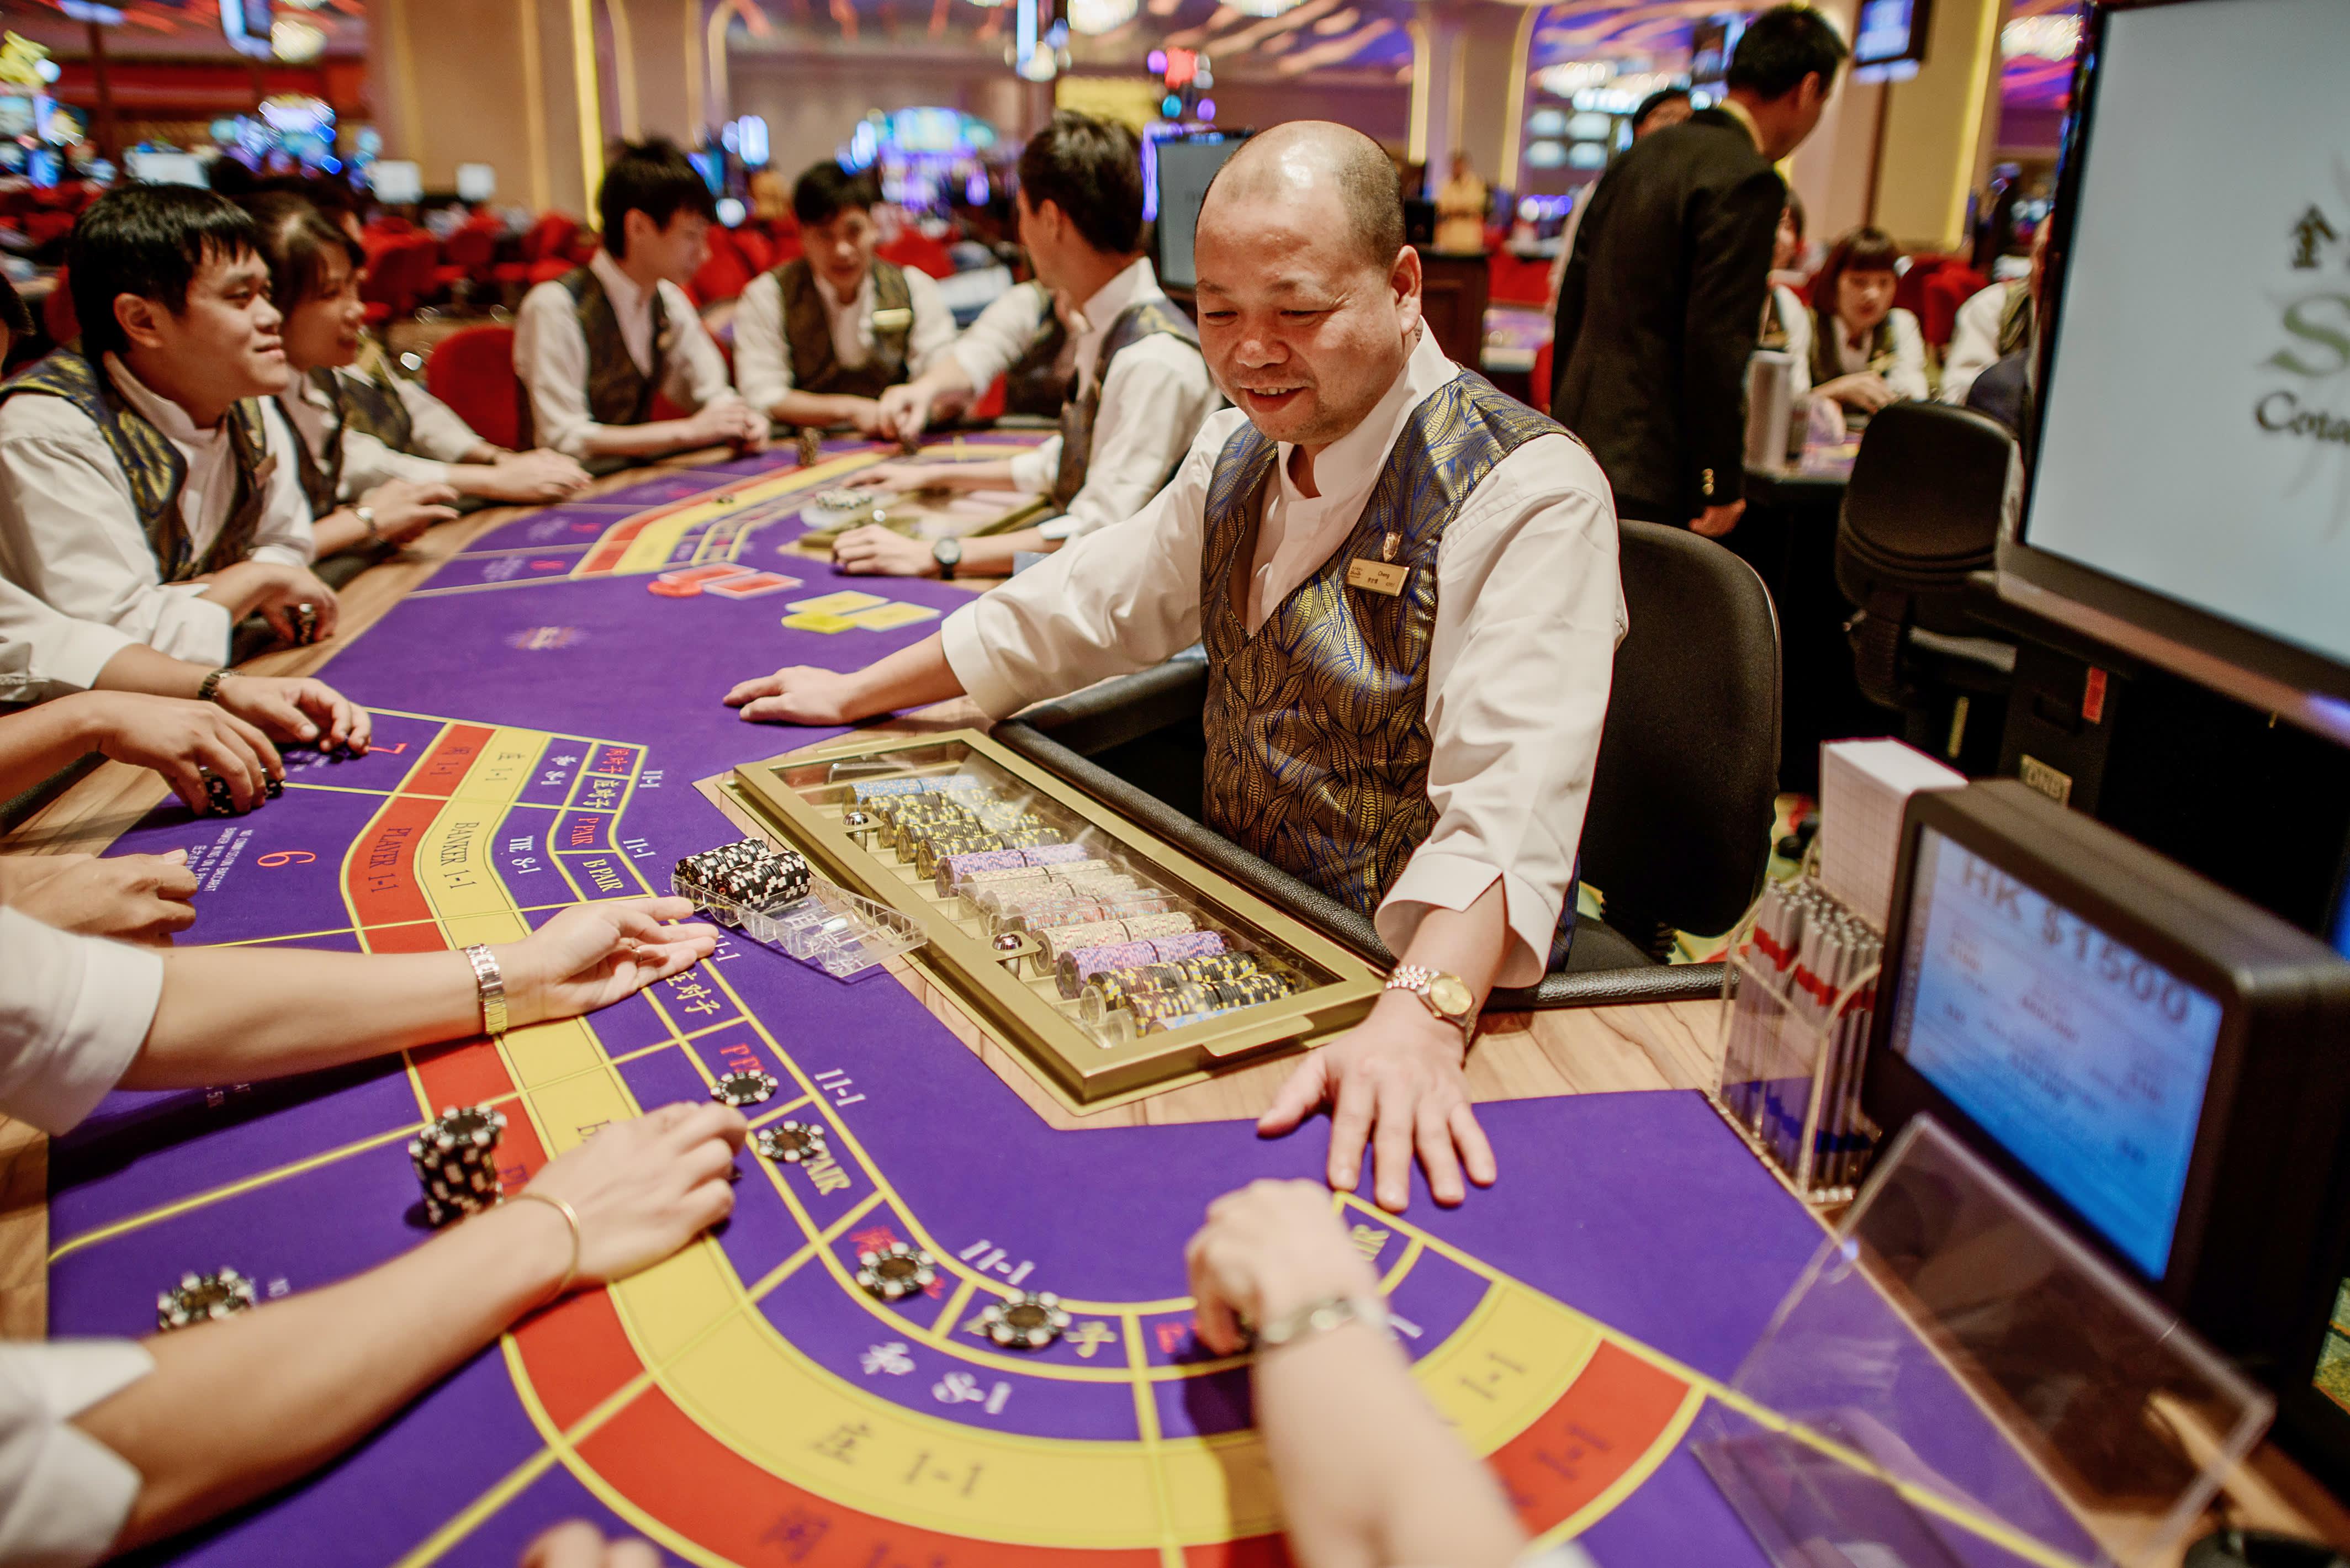 casino770 code deposit no